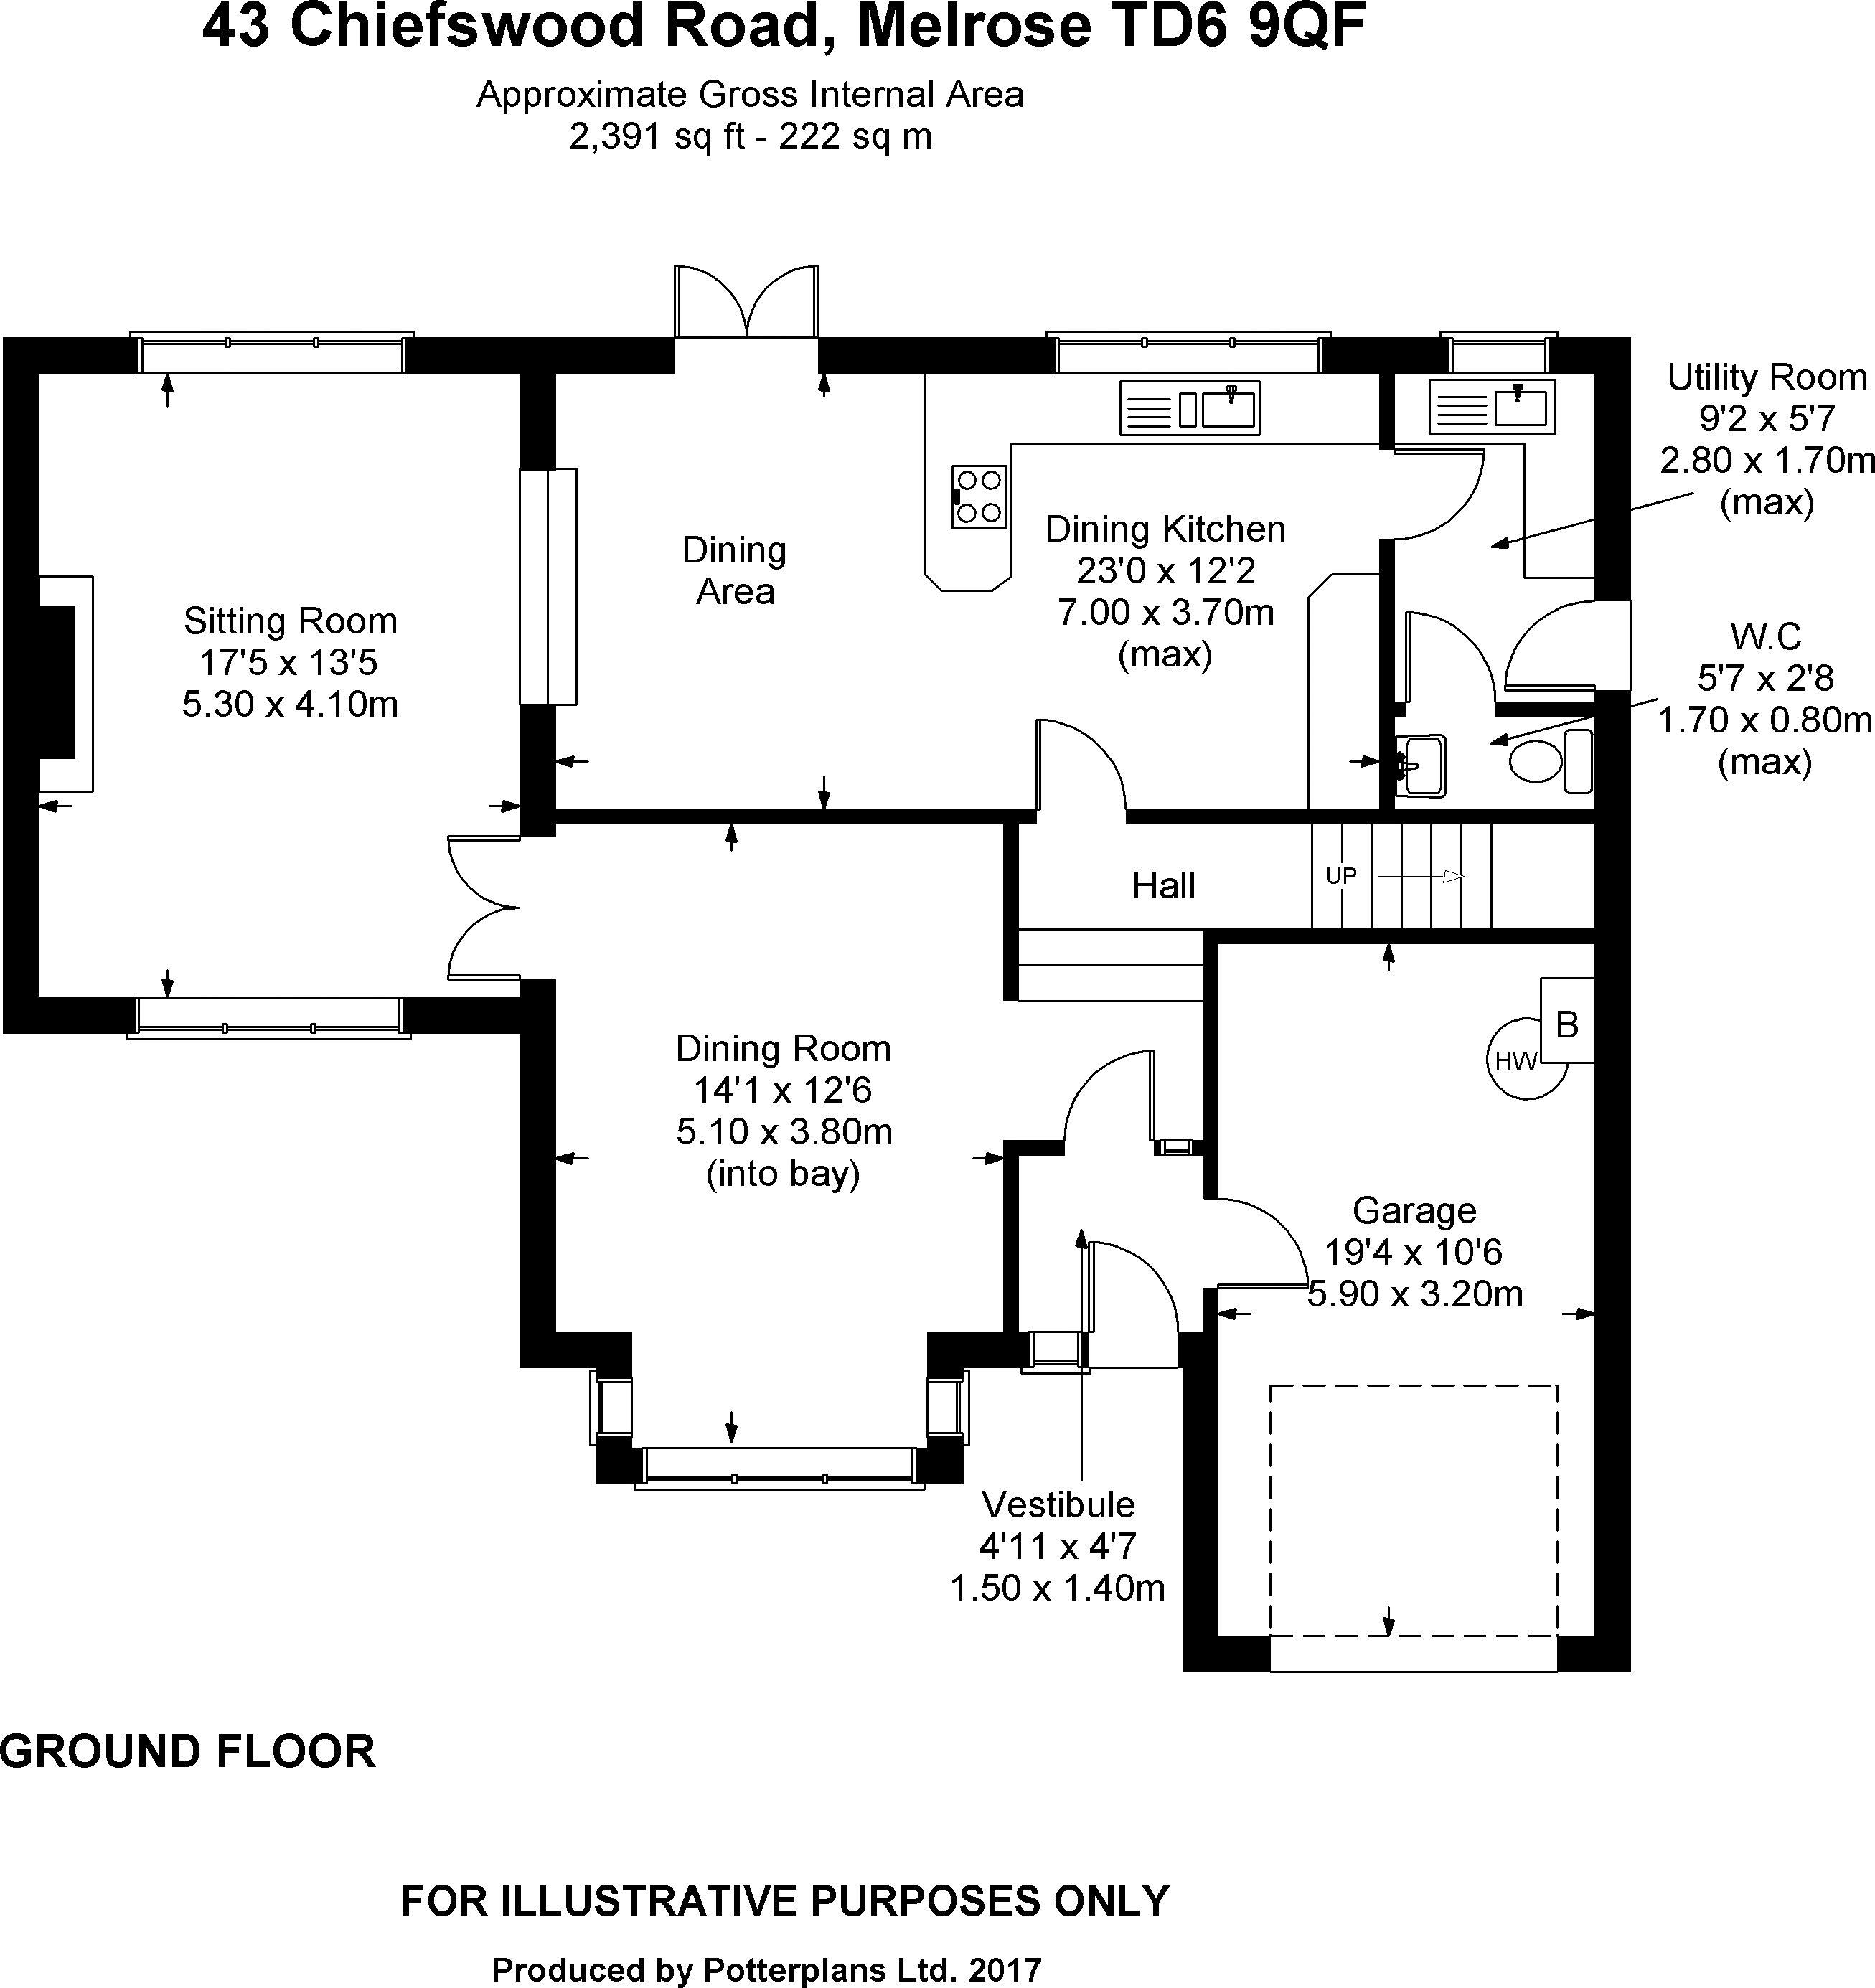 43 Chiefswood Road Ground Floor